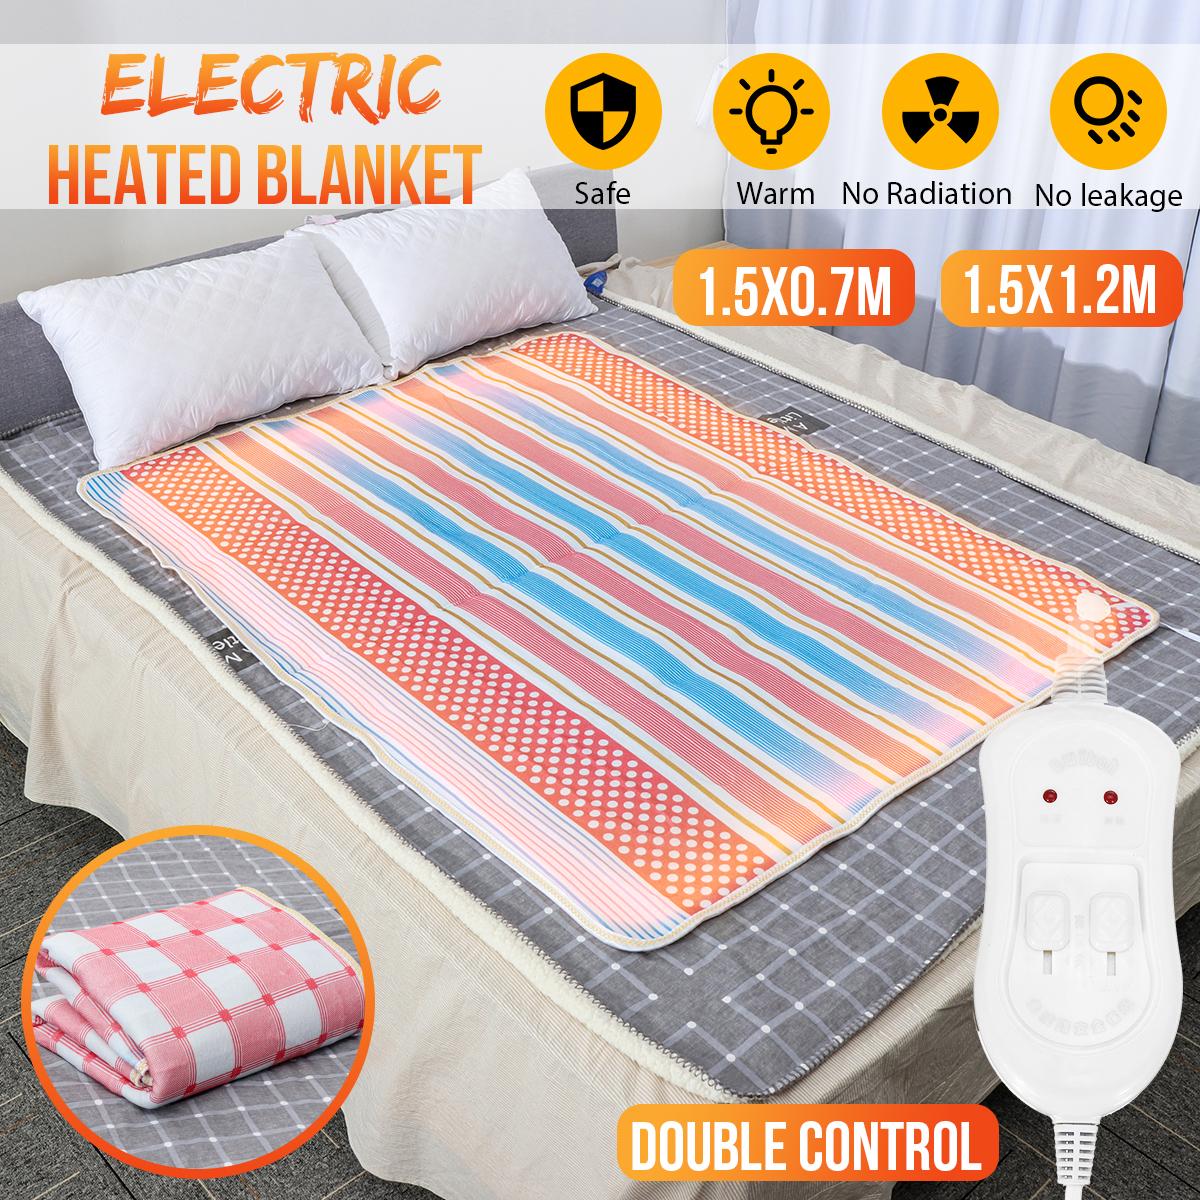 Electric Heated Blanket Warm Winter